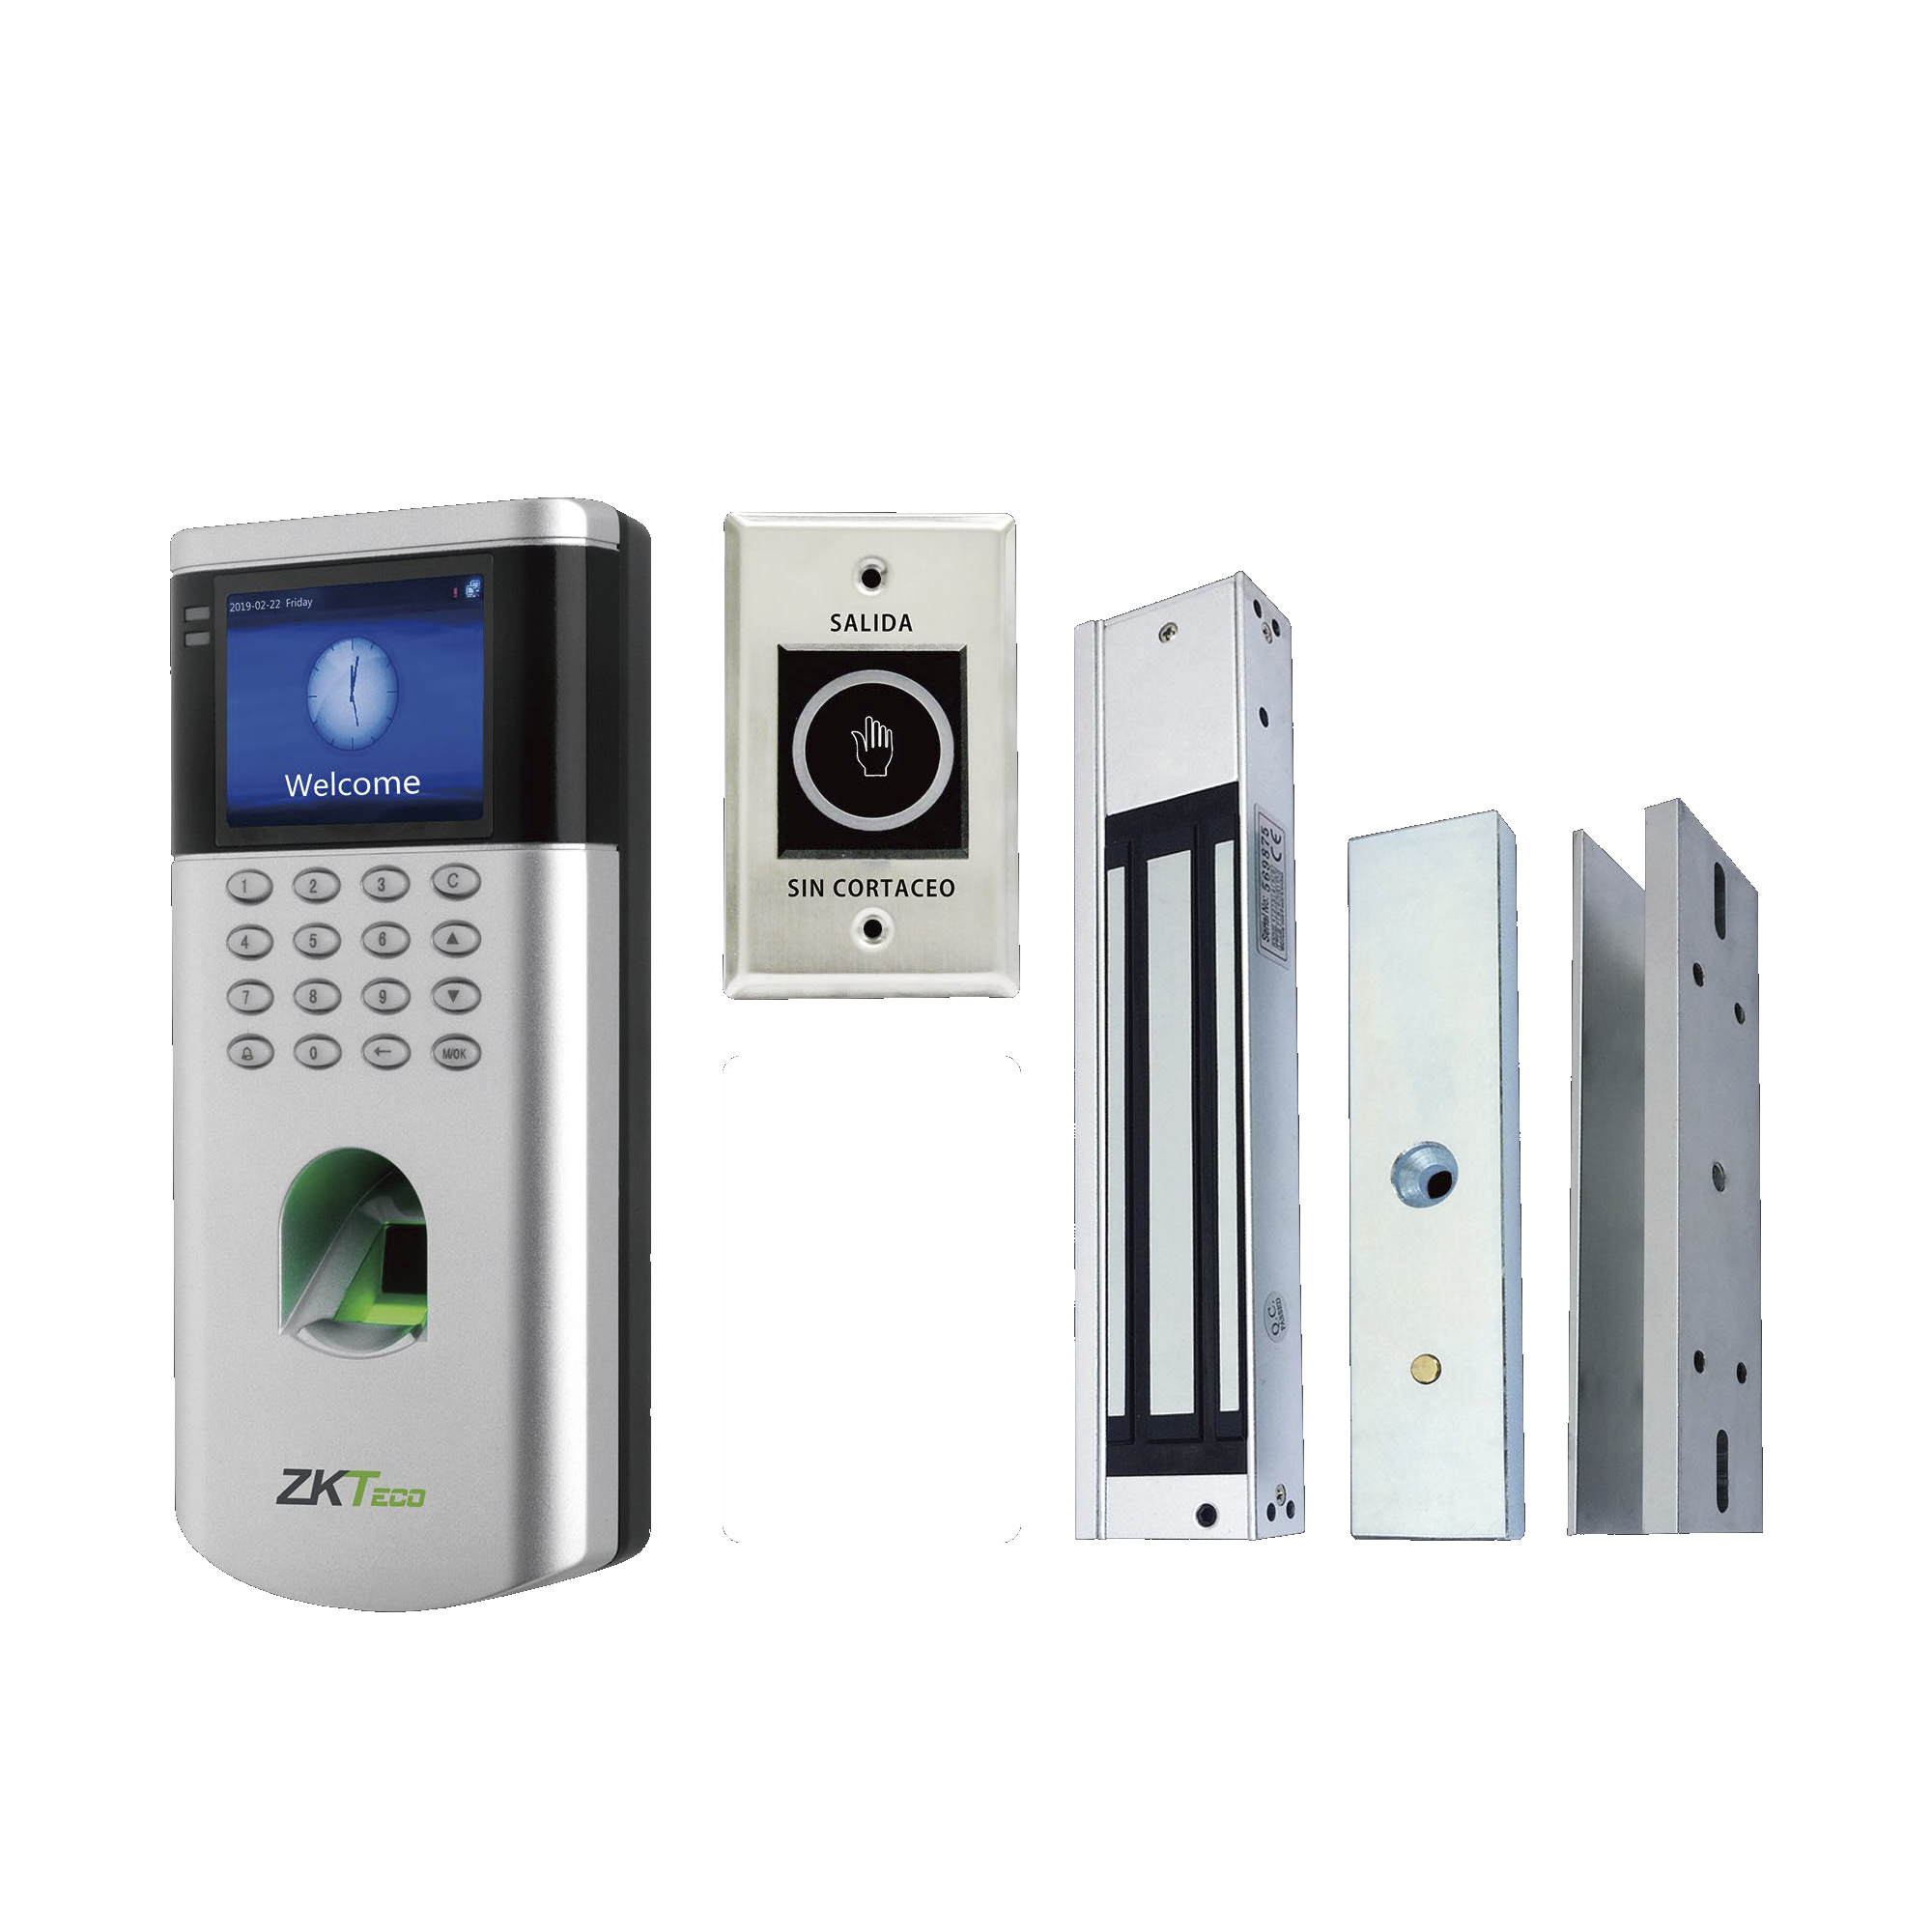 KIT de Control de Acceso LF10 / 1,500 Usuarios / Chapa magnética / Botón de Salida / Tarjeta de proximidad